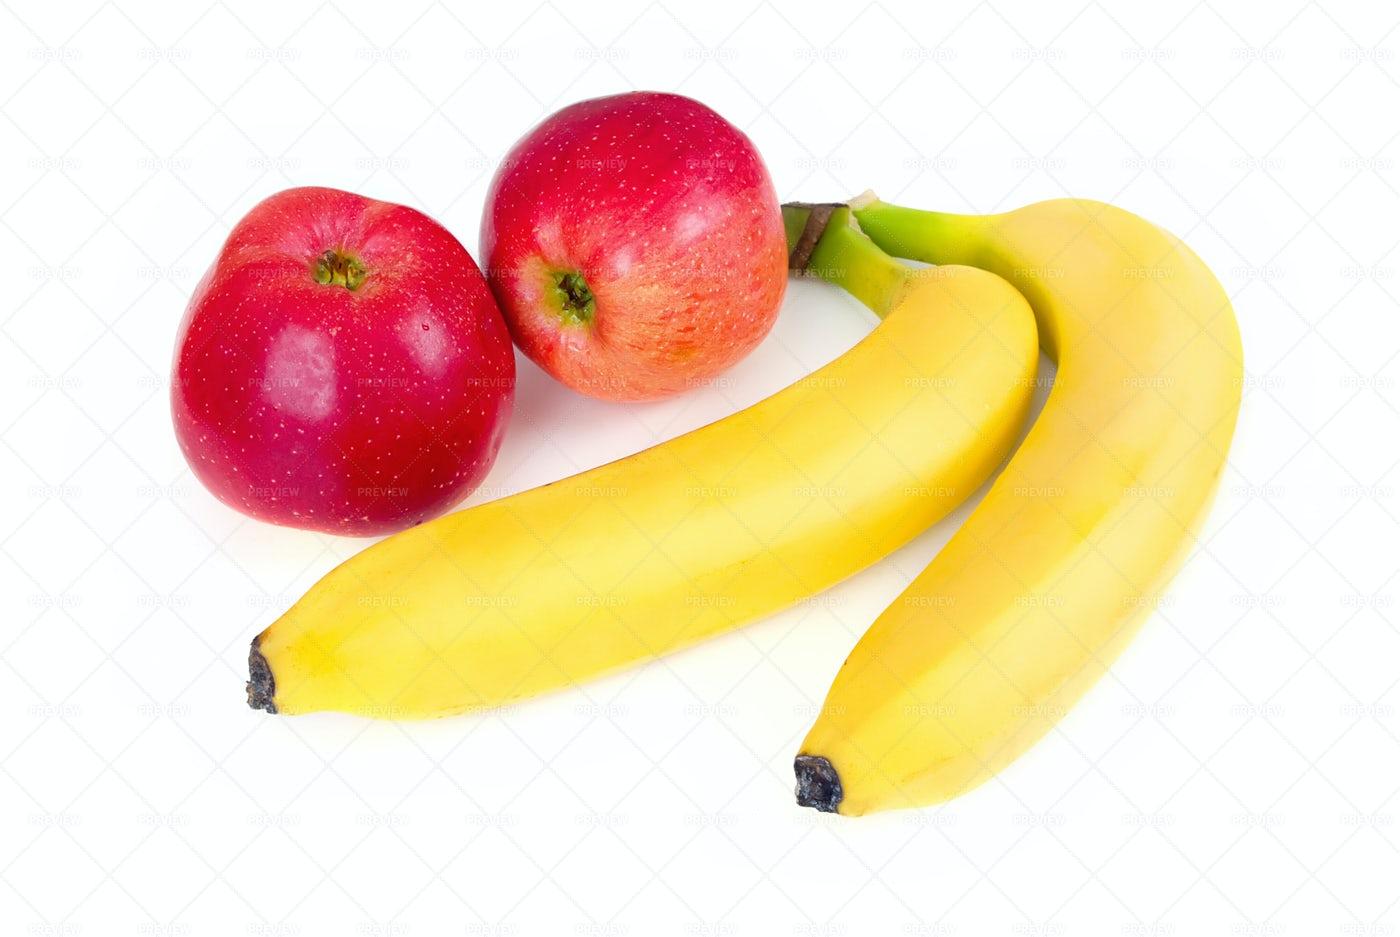 Fresh Apples And Bananas: Stock Photos